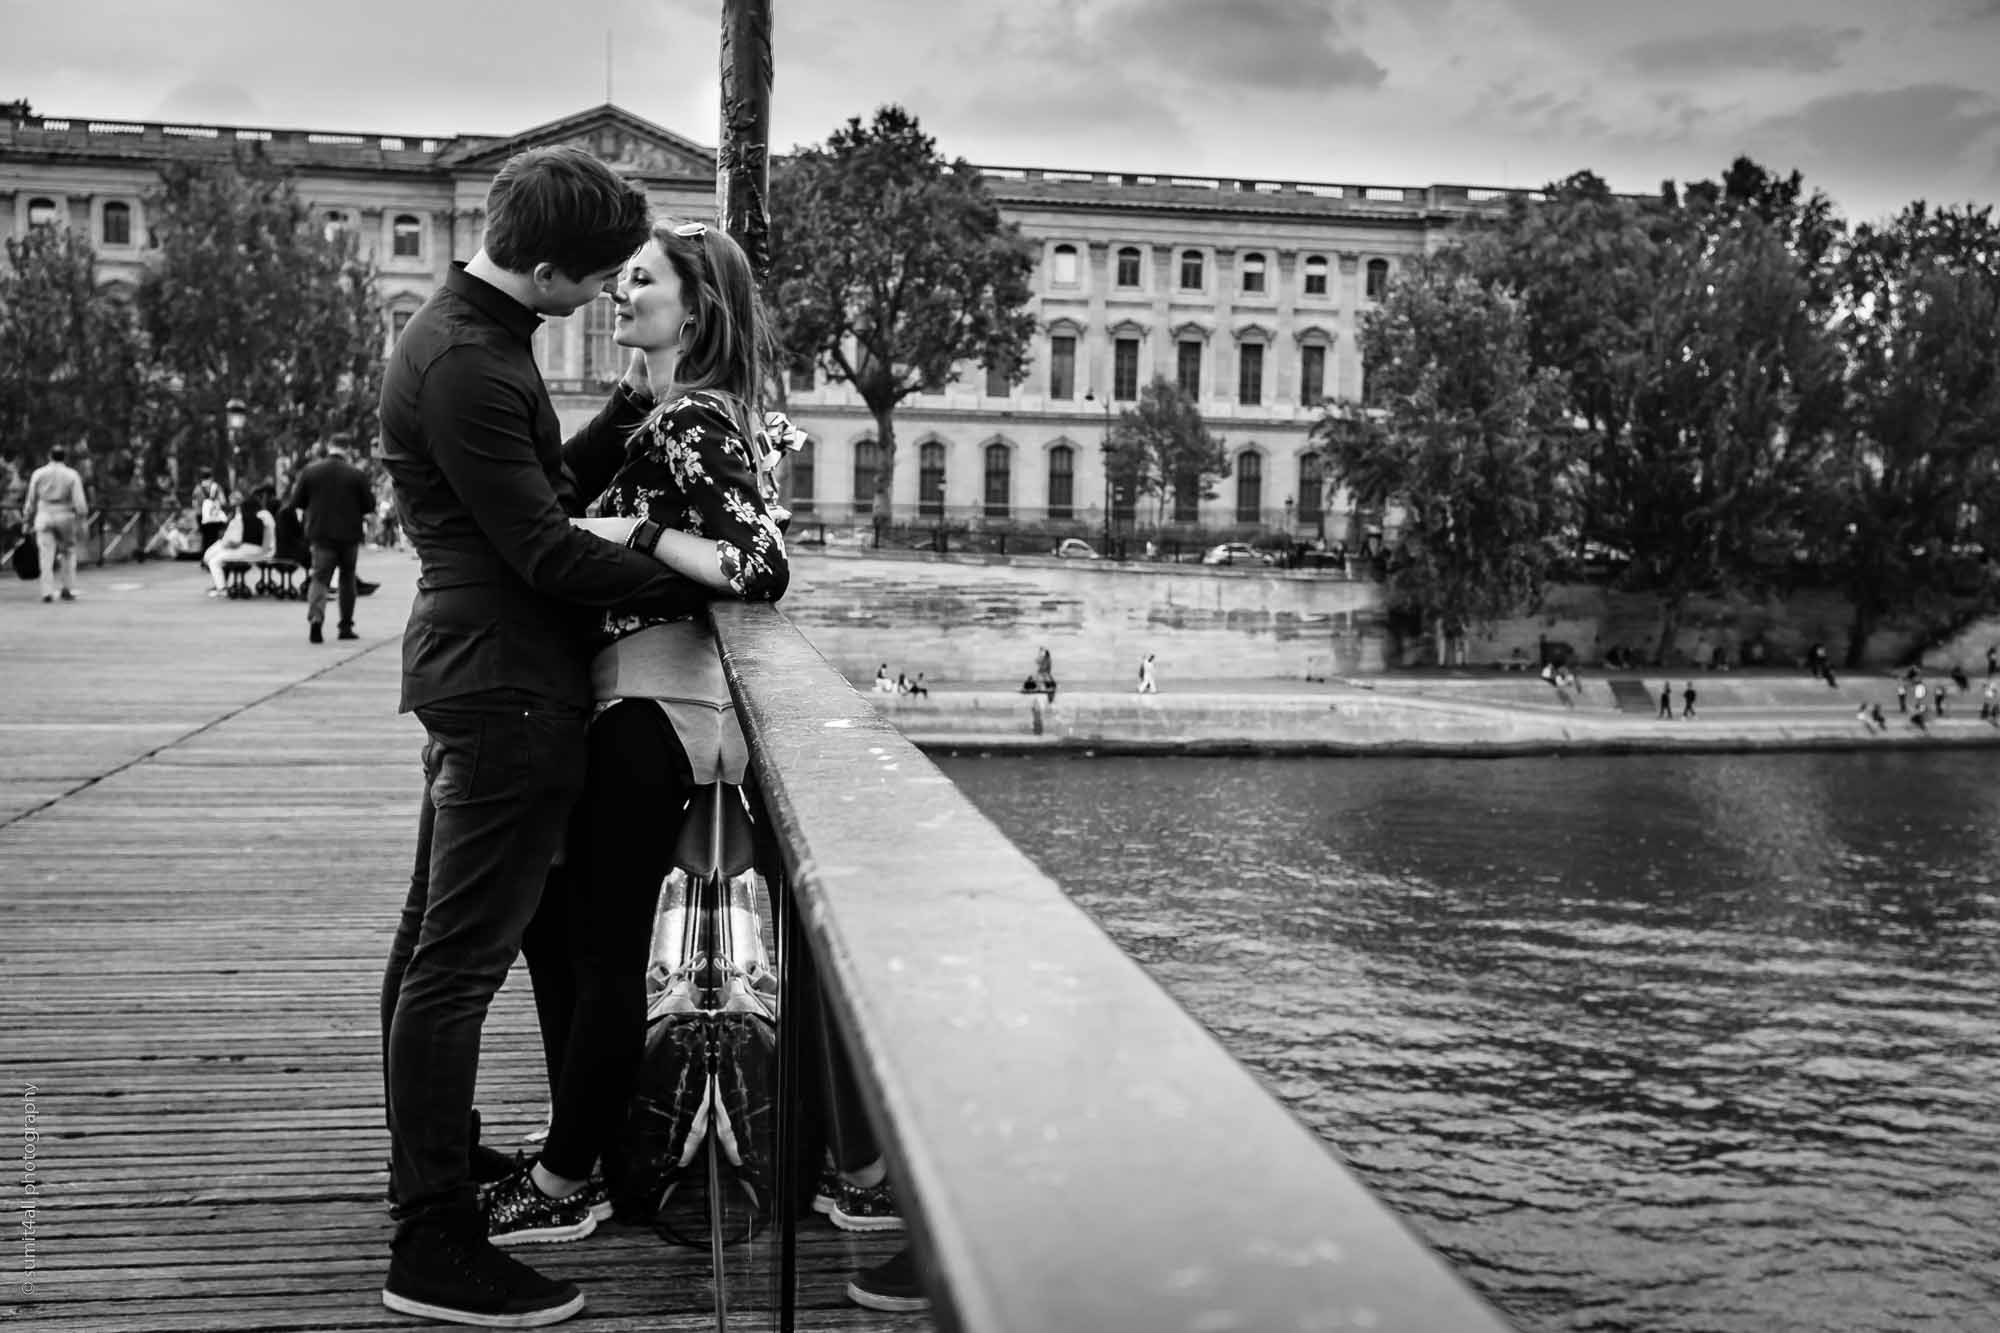 A couple kiss over a bridge on the Seine River in Paris